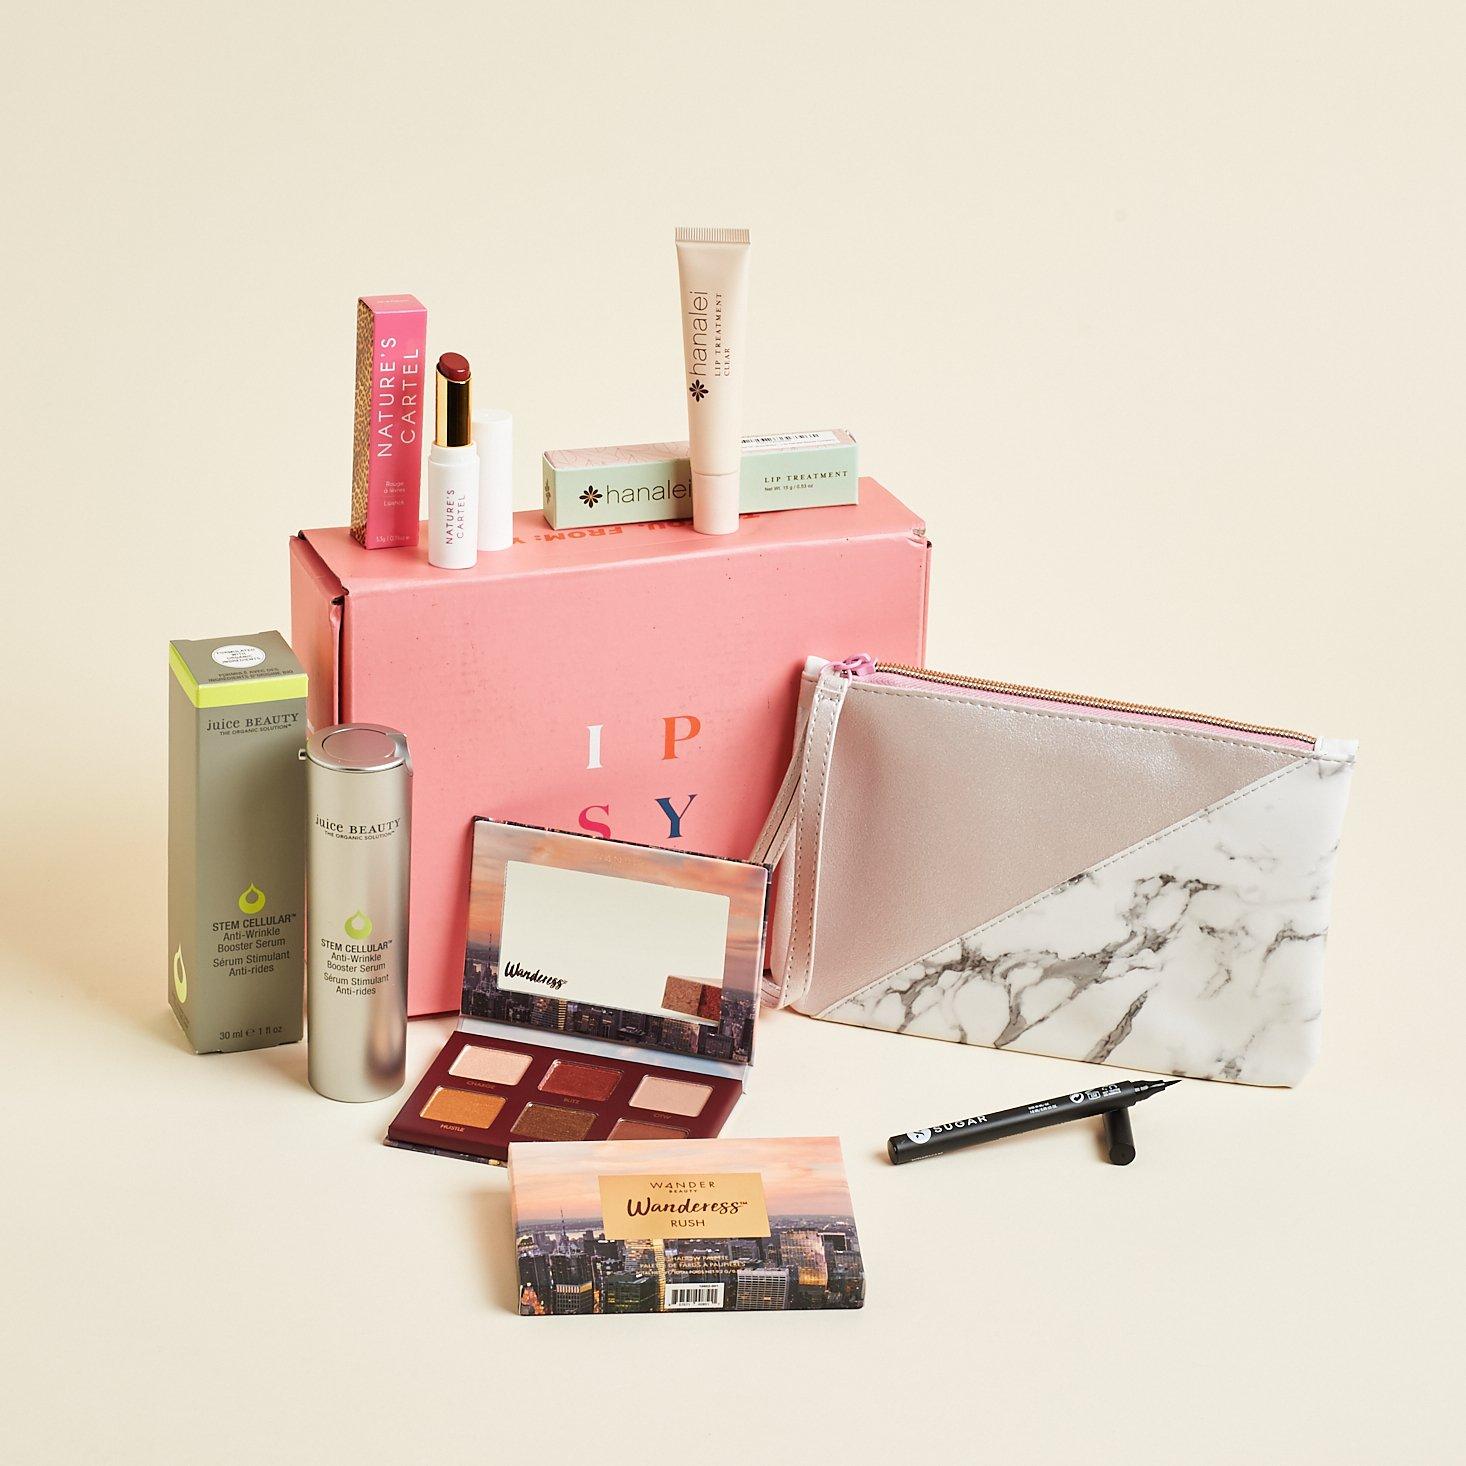 Ipsy Glam Bag Plus